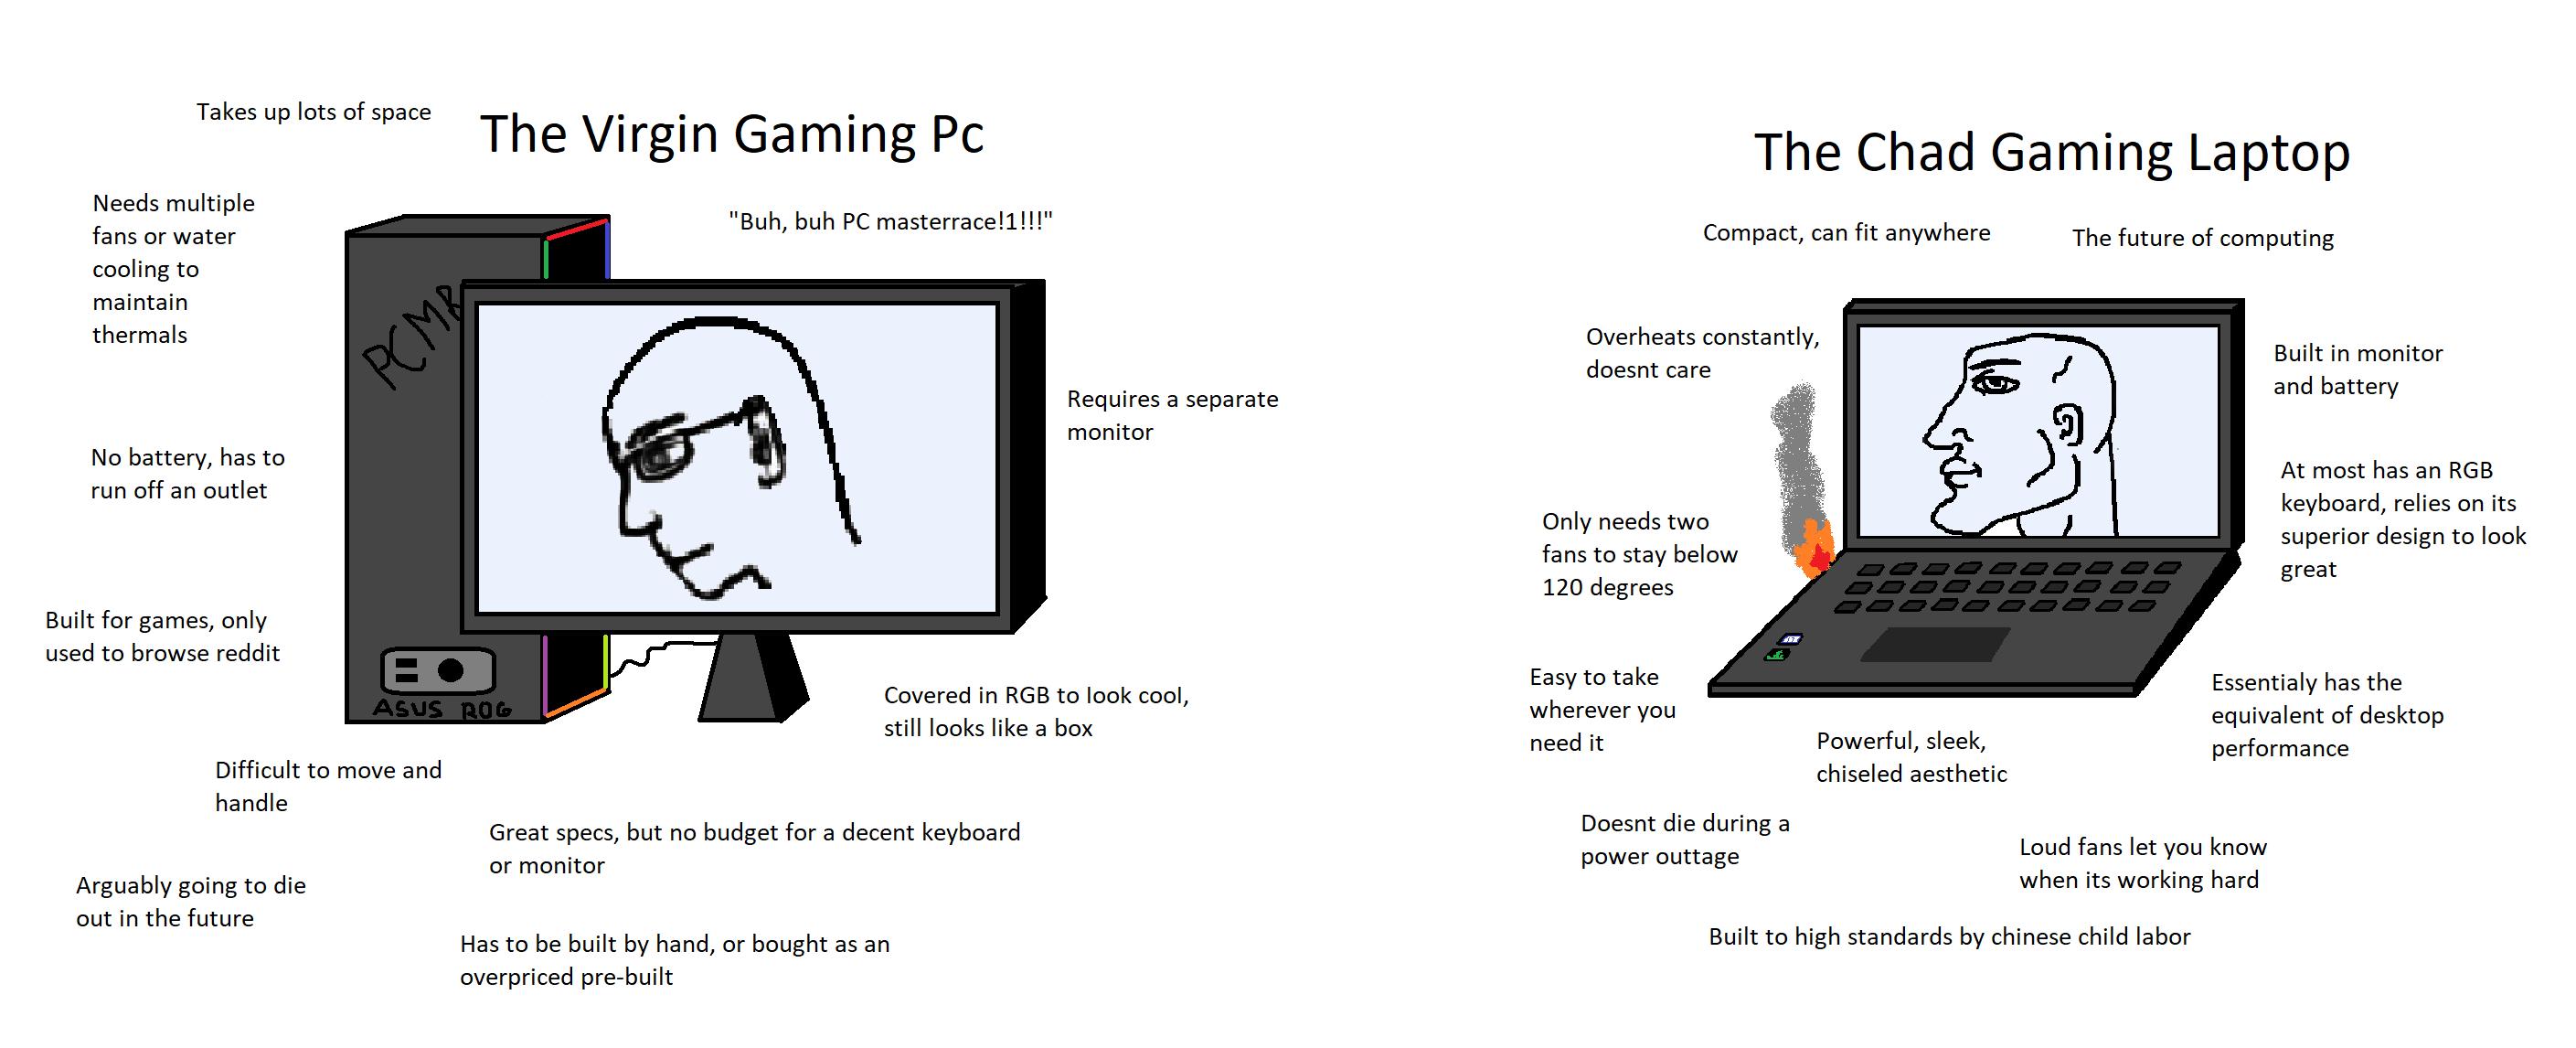 The Virgin Gaming Pc Vs The Chad Gaming Laptop Virginvschad